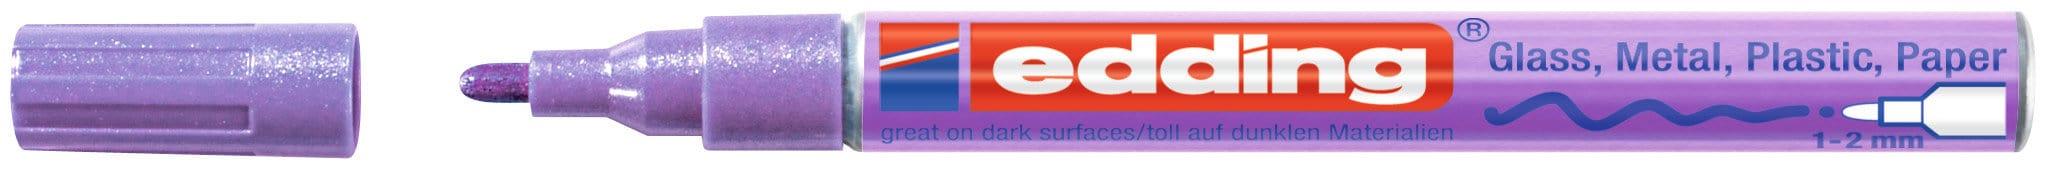 Edding edding Lackmarker 751 CREA